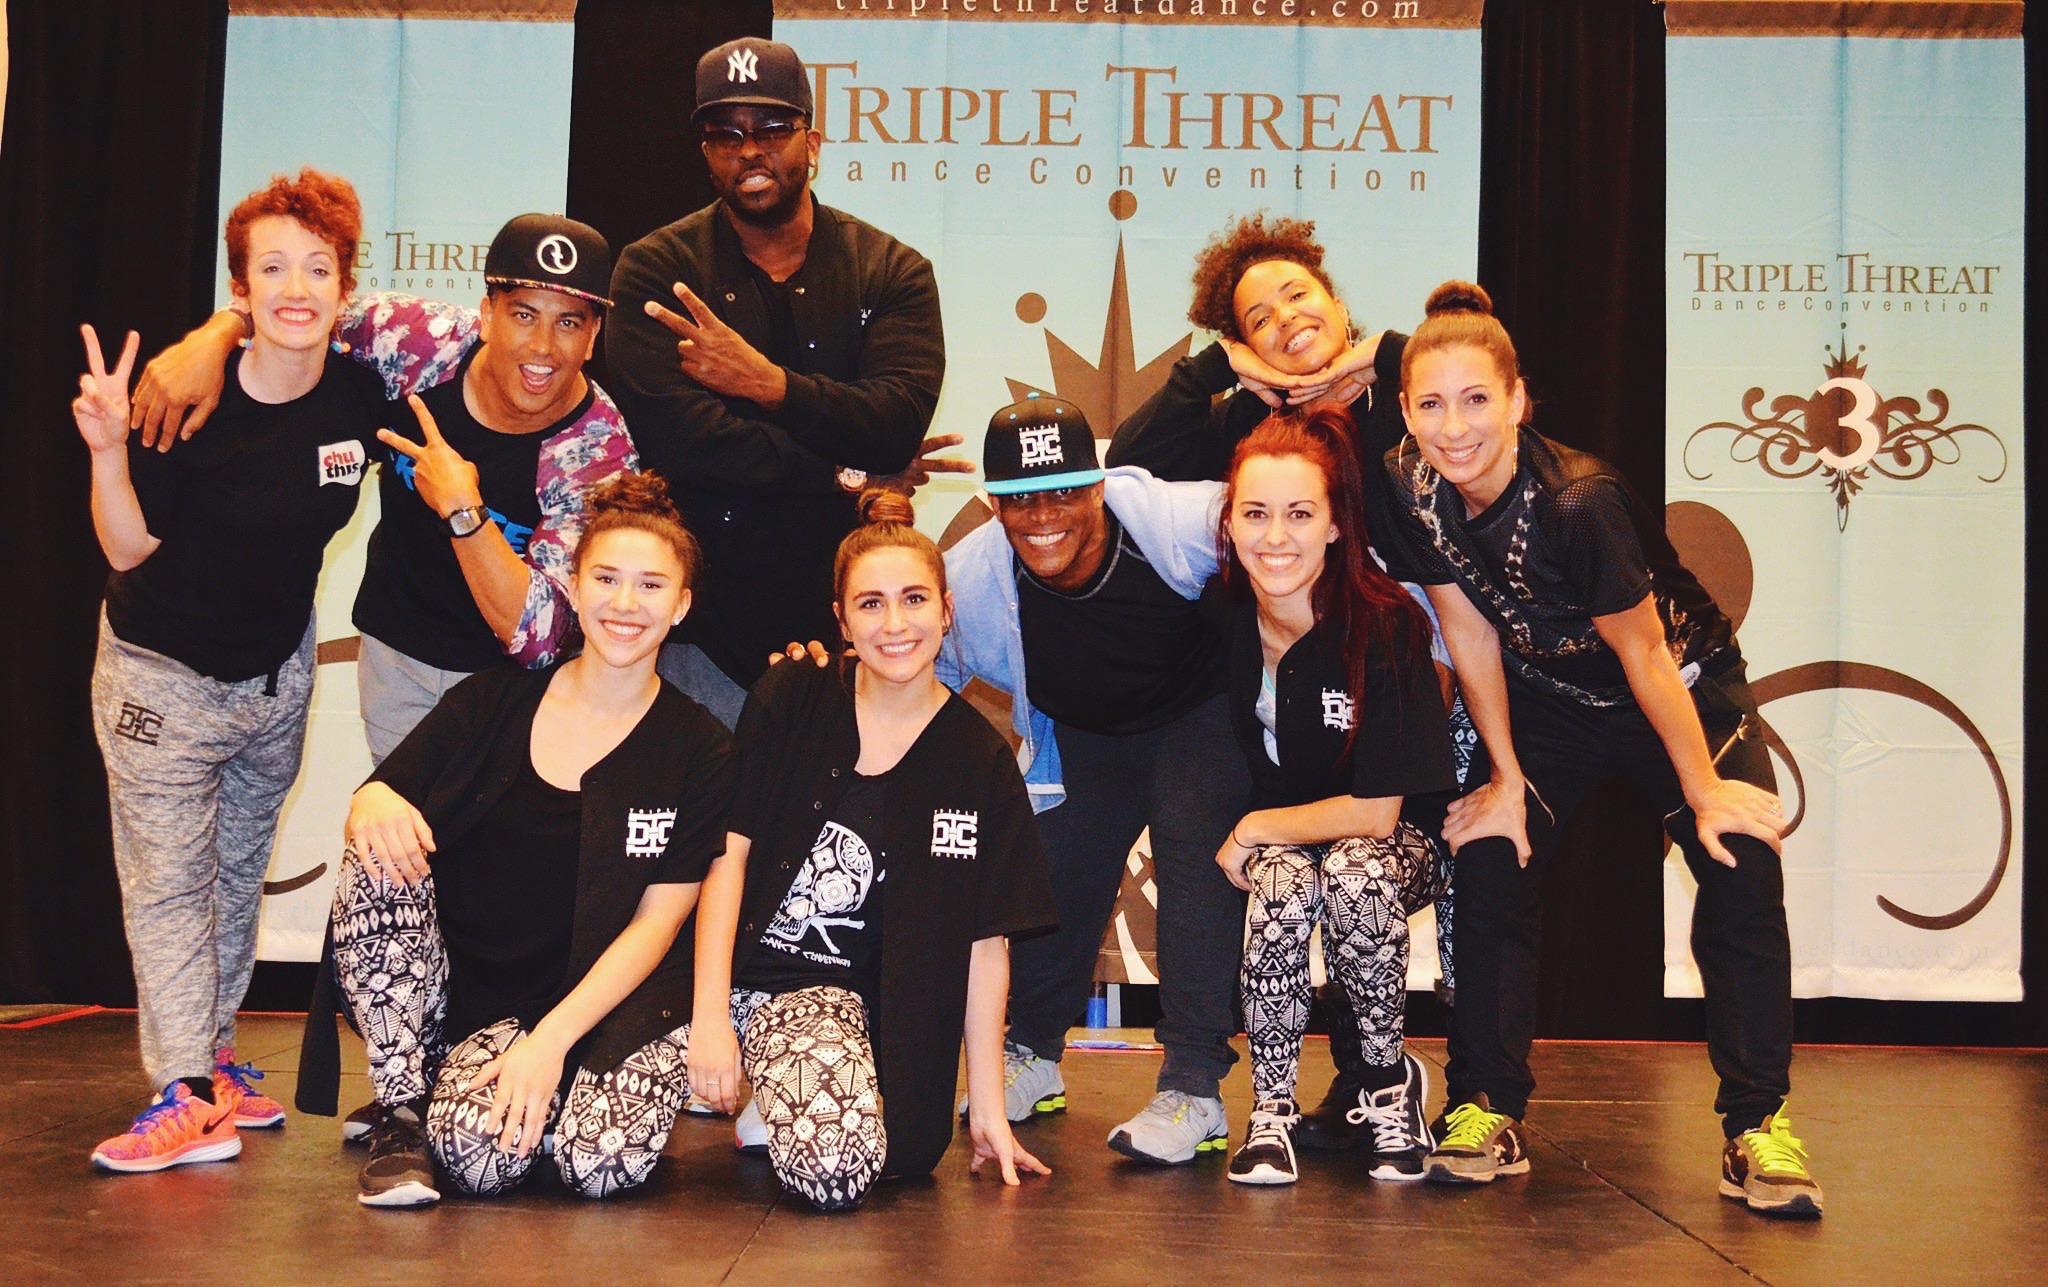 Triple Threat Dance Convention